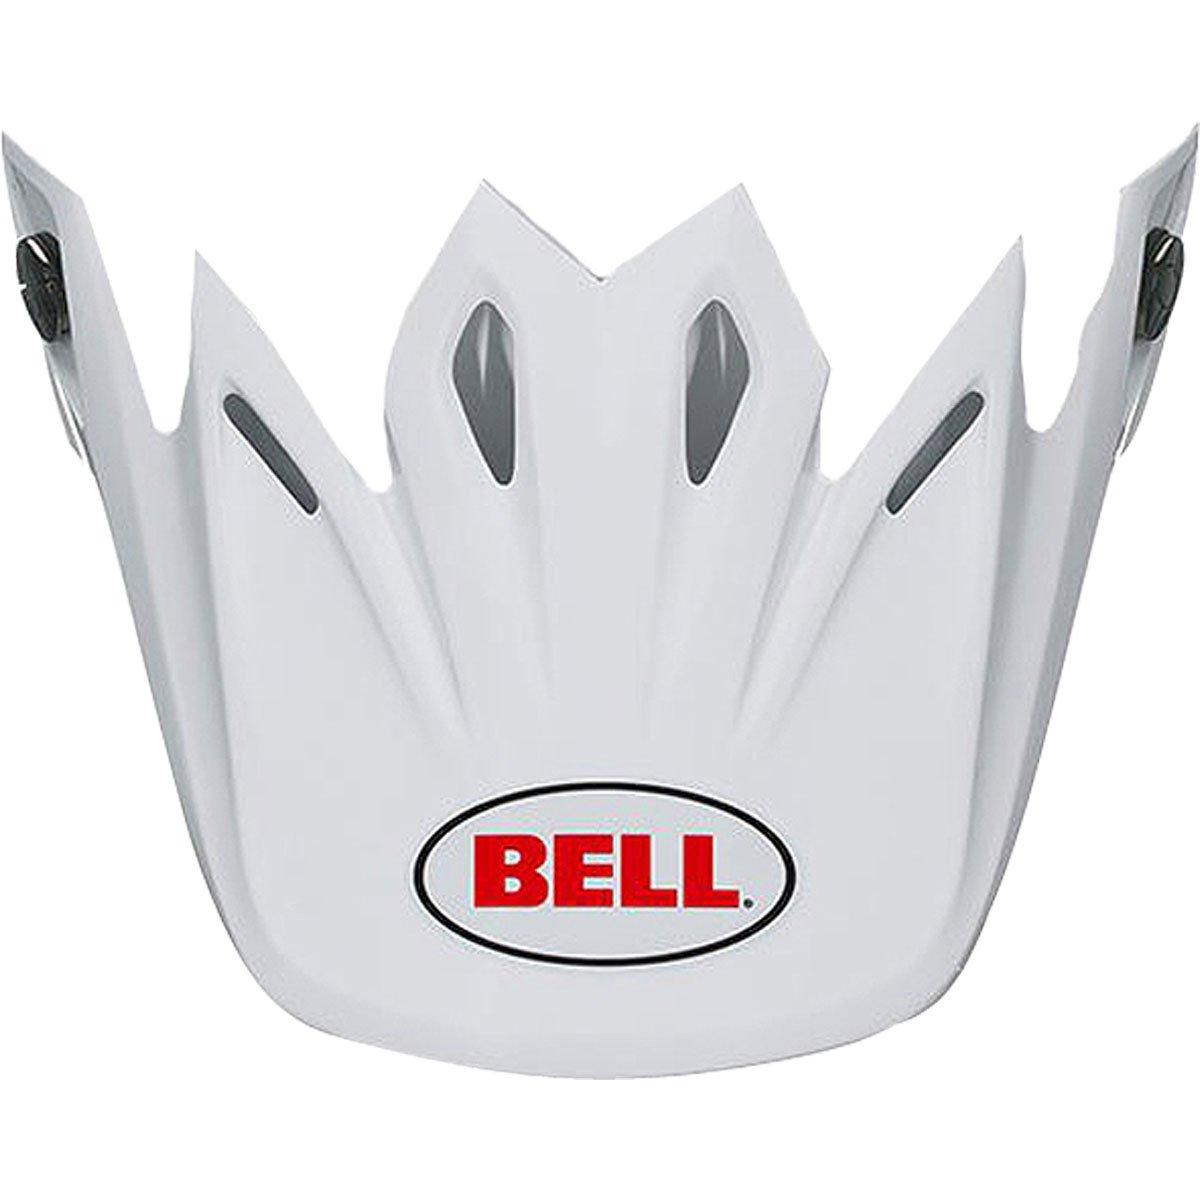 Bell Moto-9 Flex Solid Visor Street Motorcycle Helmet Accessories - White/One Size